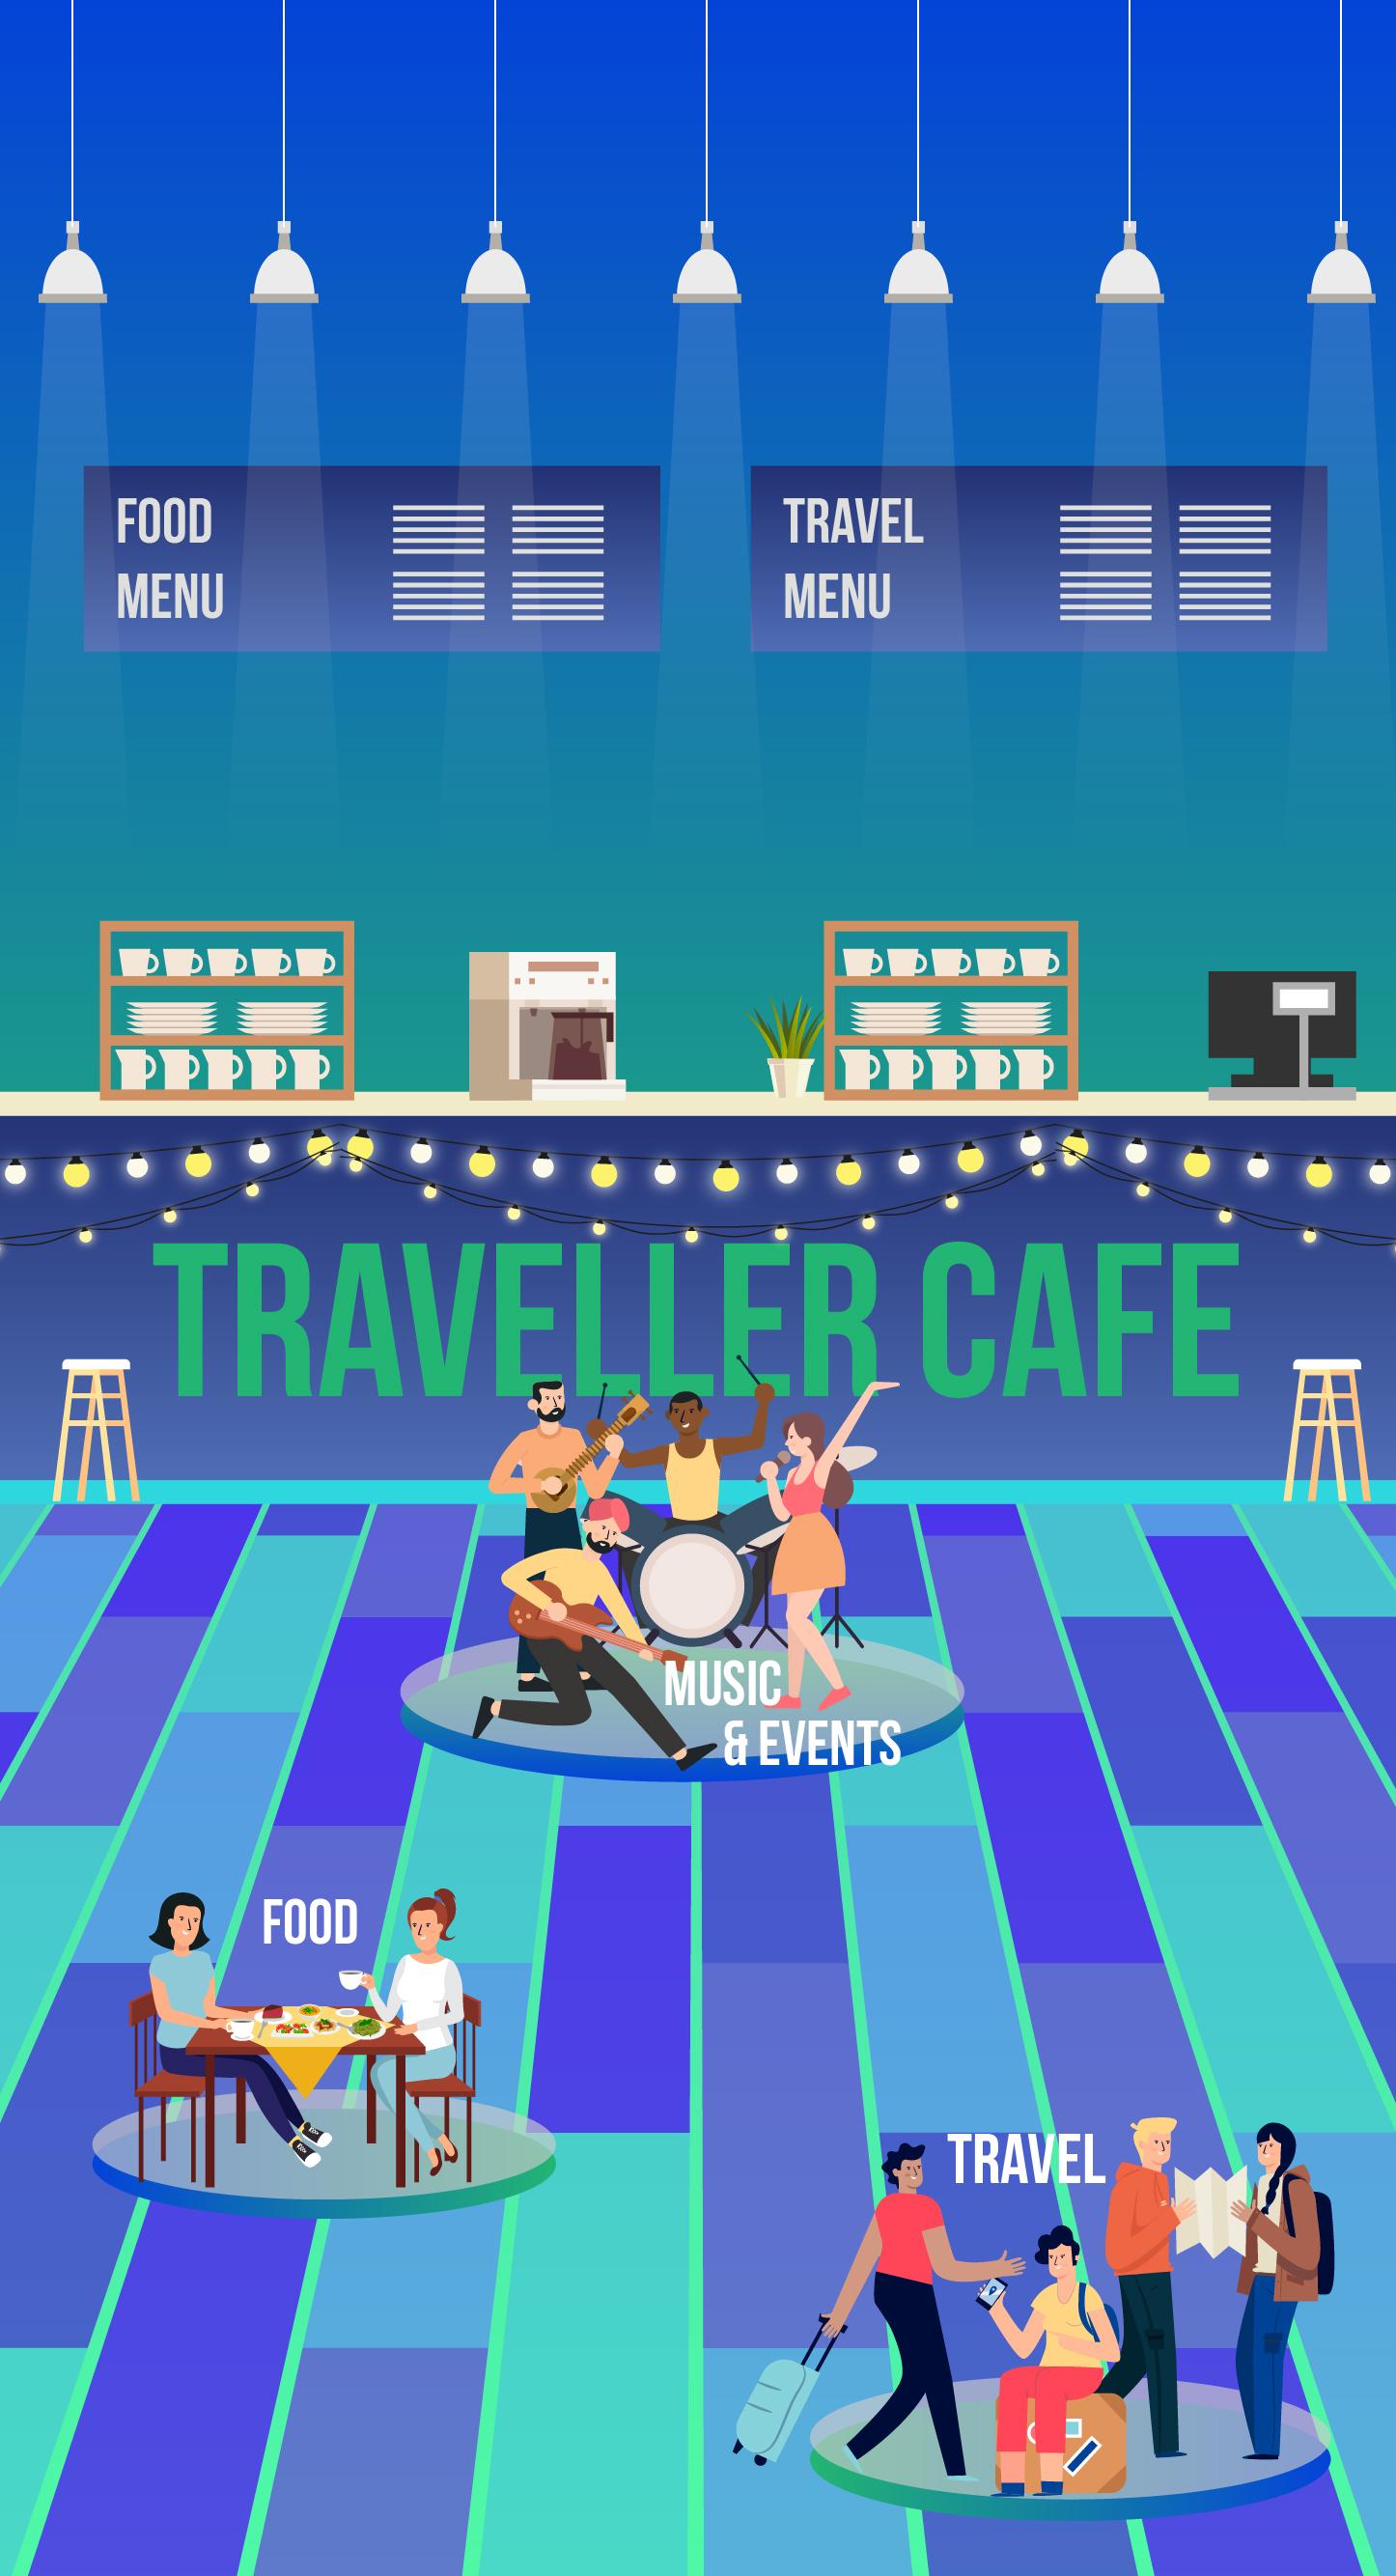 traveller cafe vertical-01.jpg